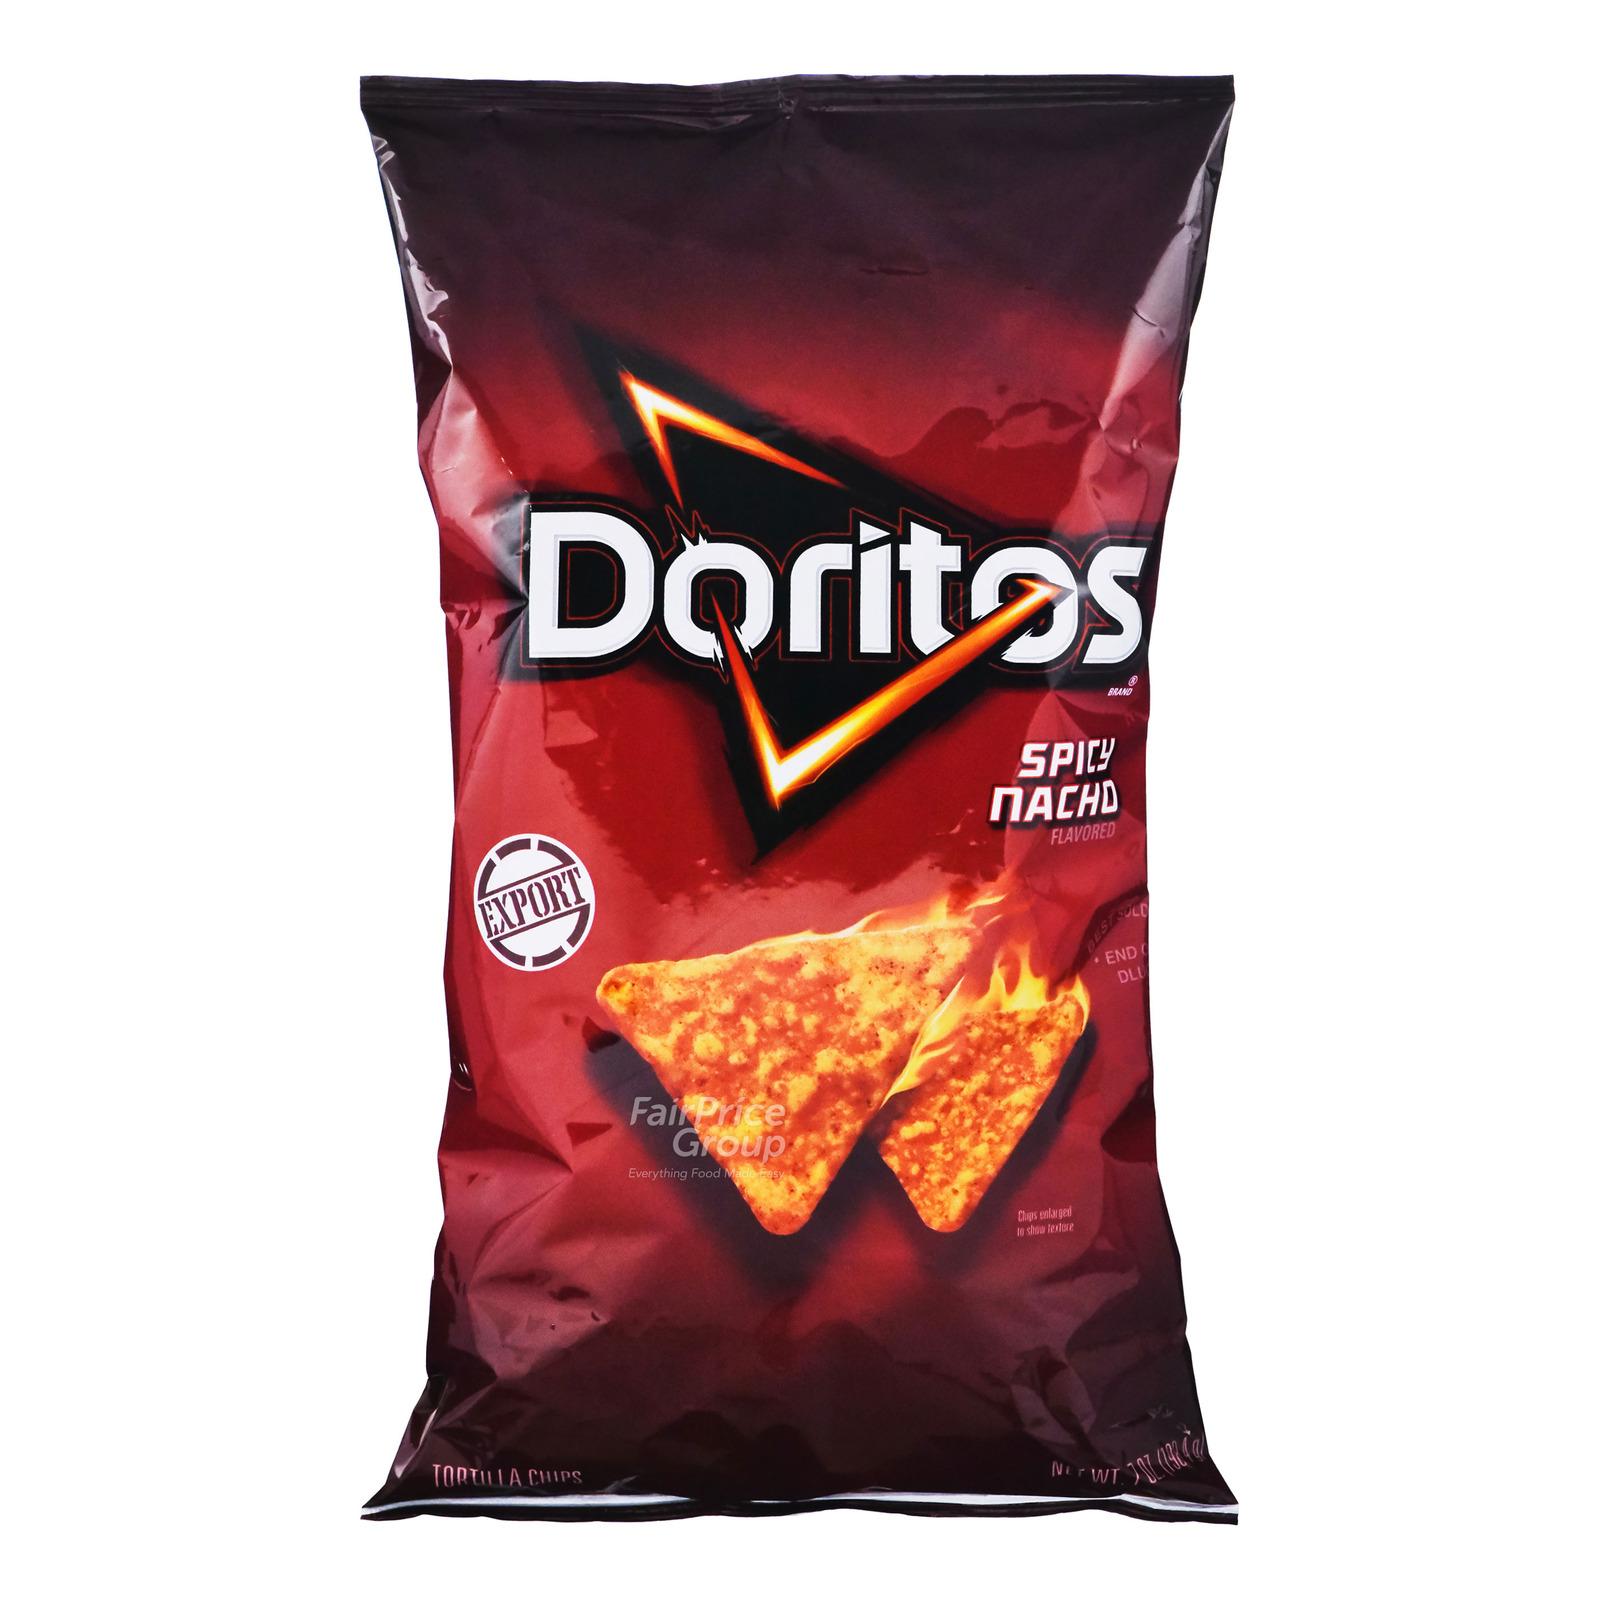 Doritos Tortilla Chips - Spicy Nacho